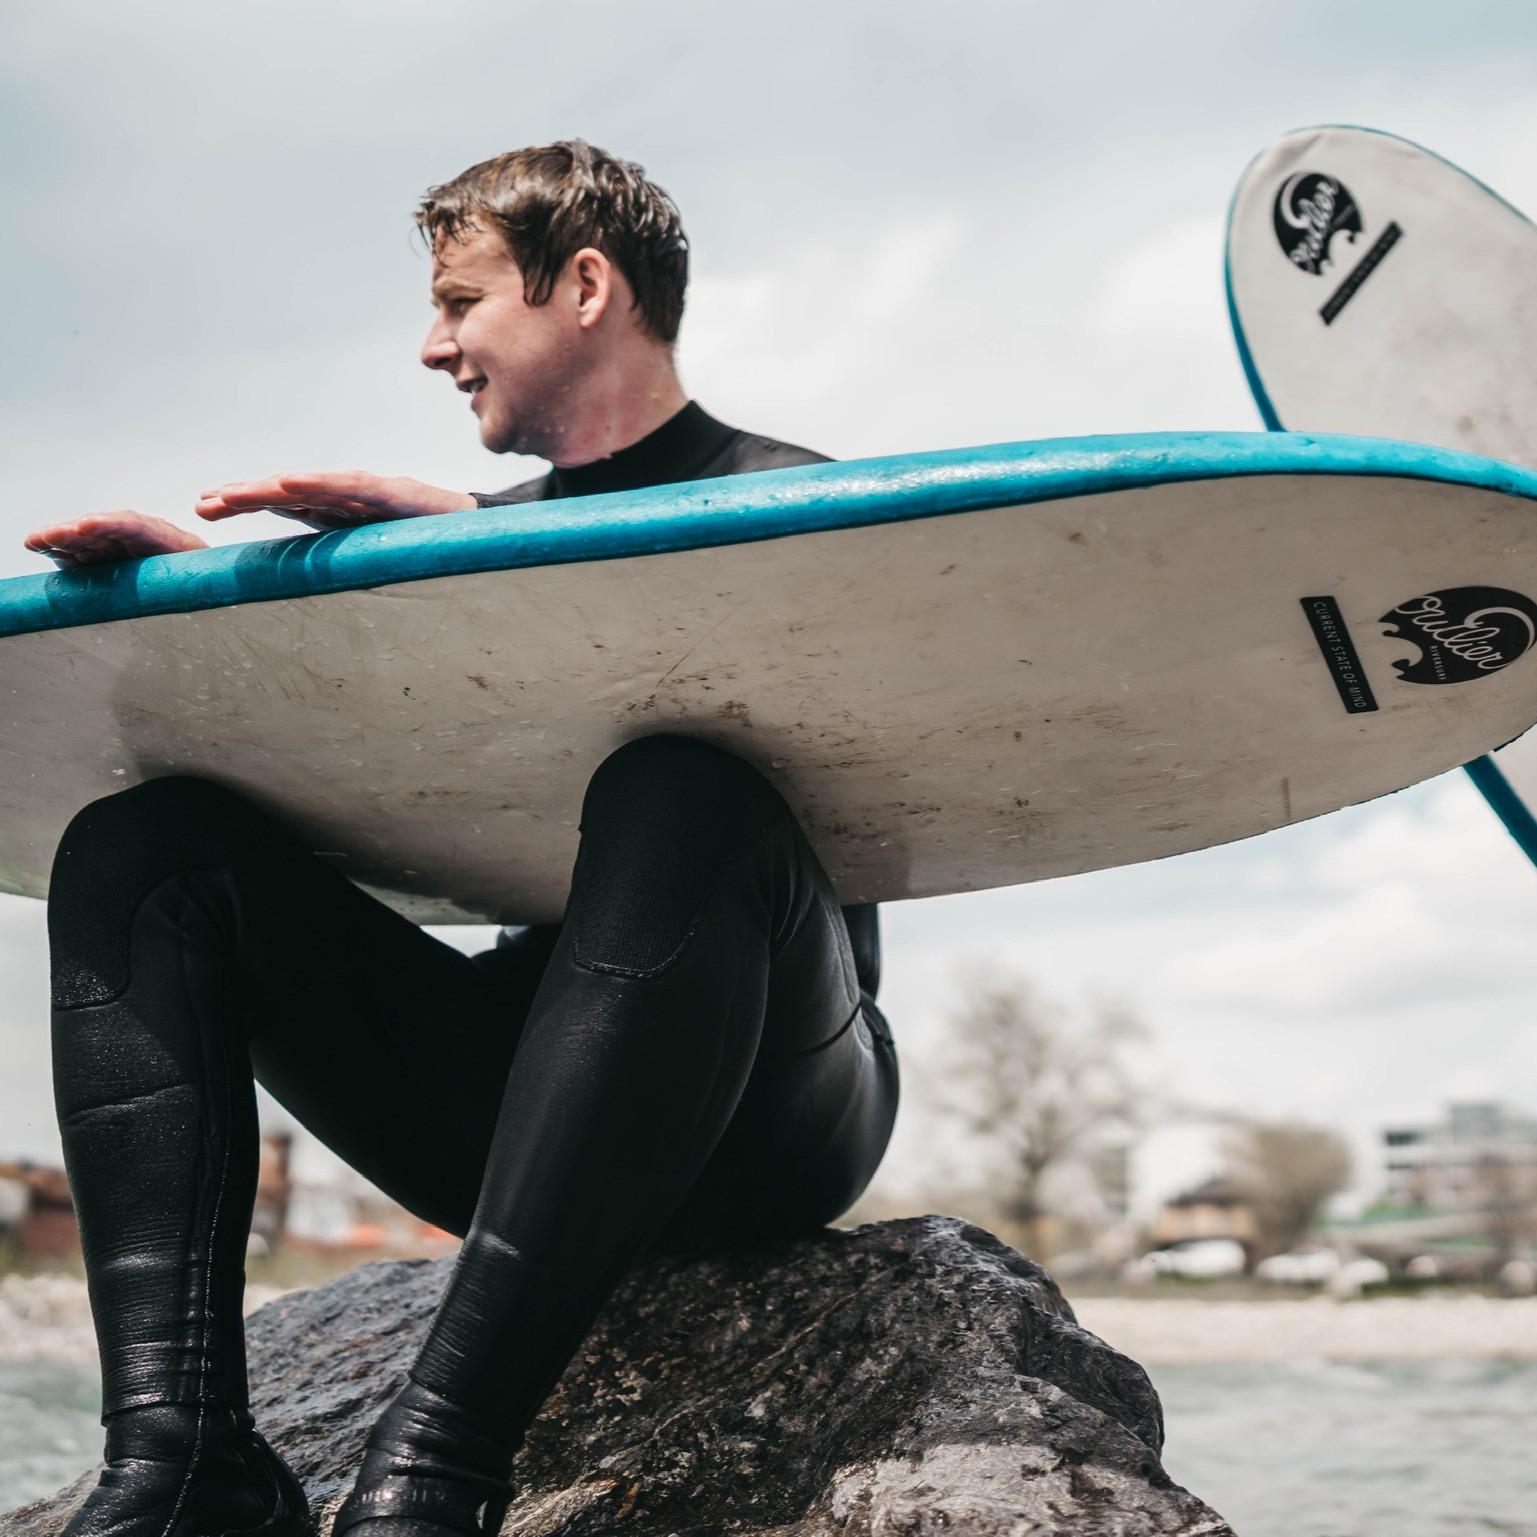 Surfboard + Wetsuit Rental